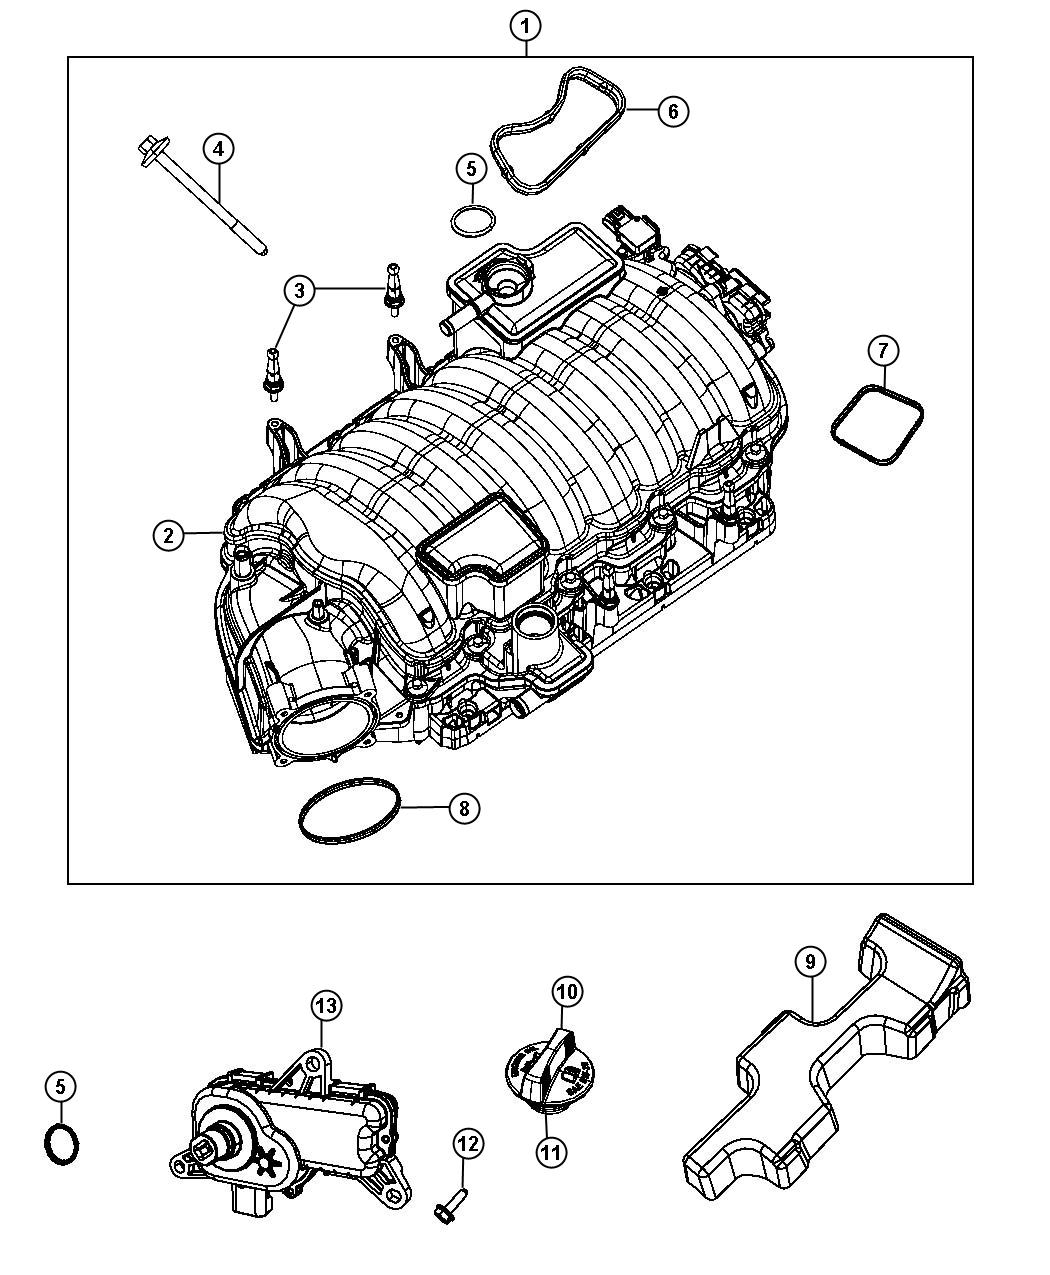 2012 Dodge Charger Actuator. Intake short running valve